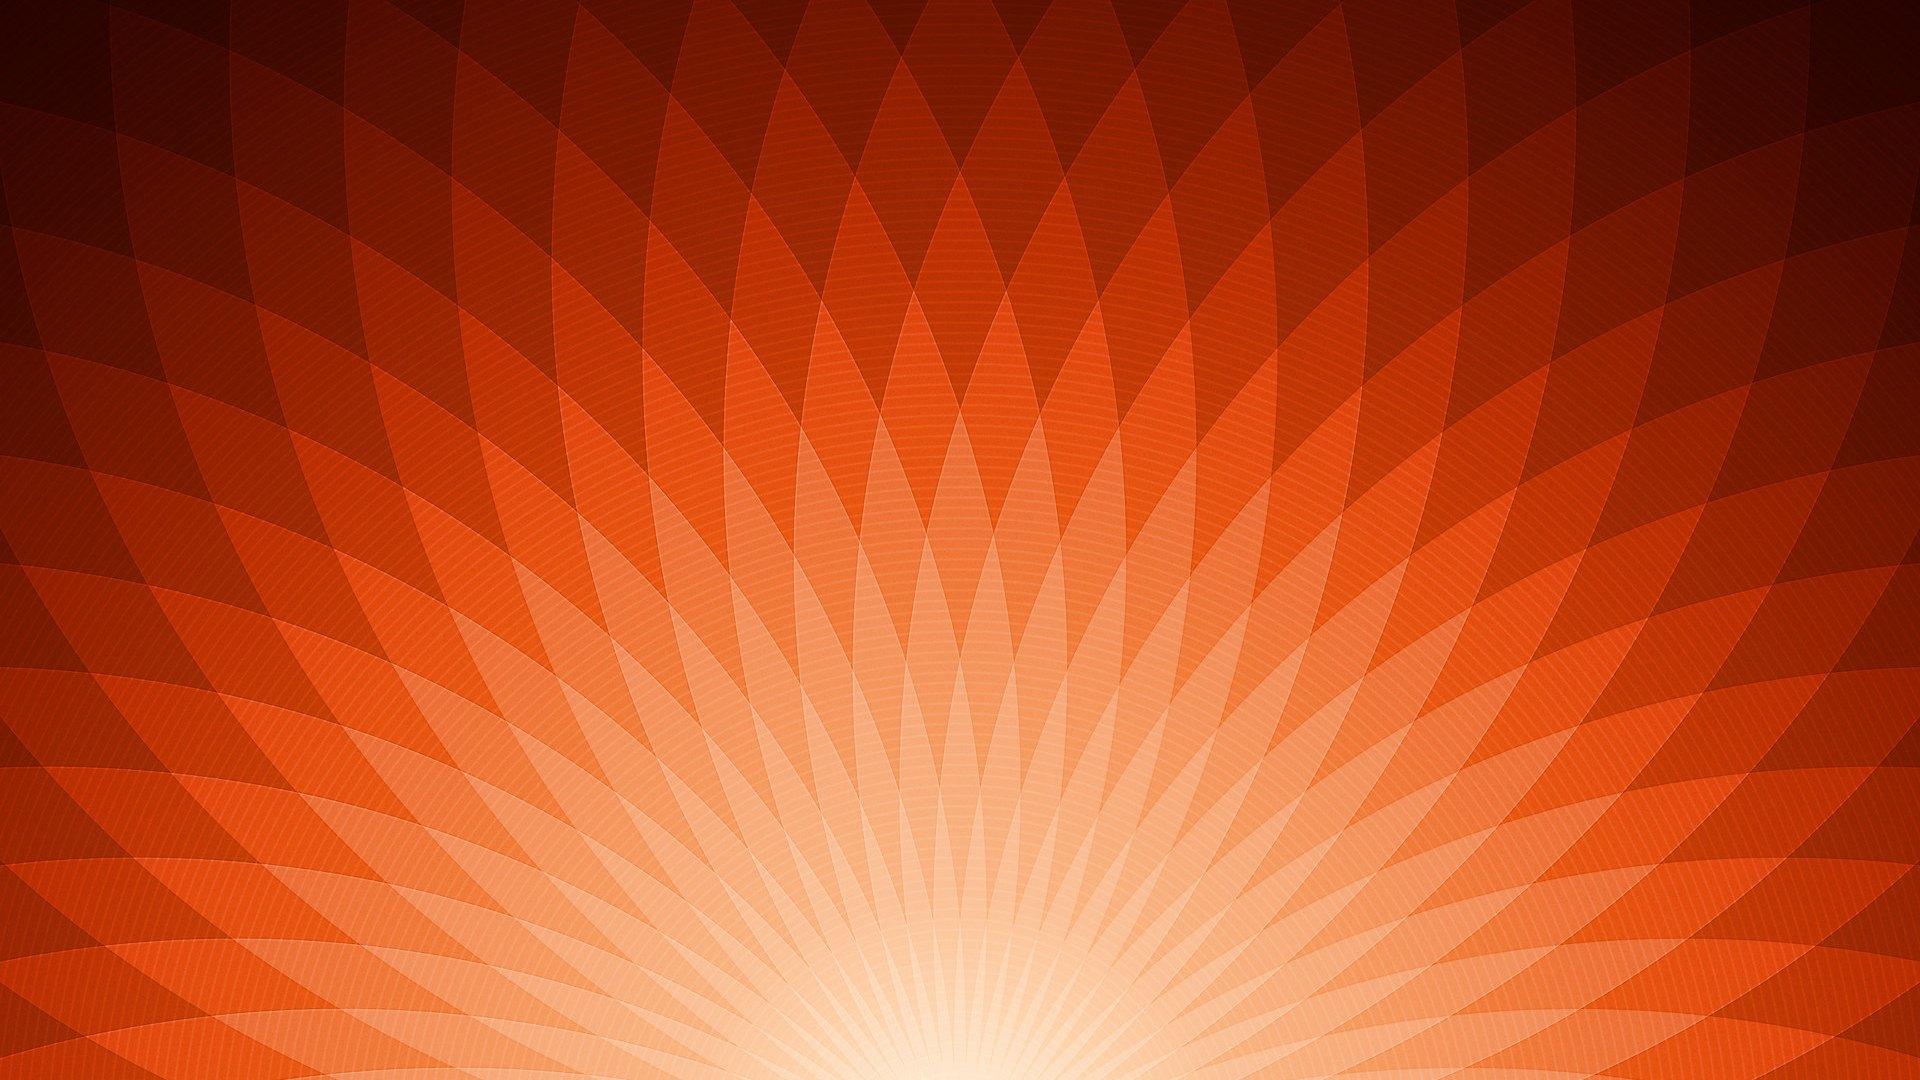 [Resim: pattern_texture1157hvsbv.jpg]